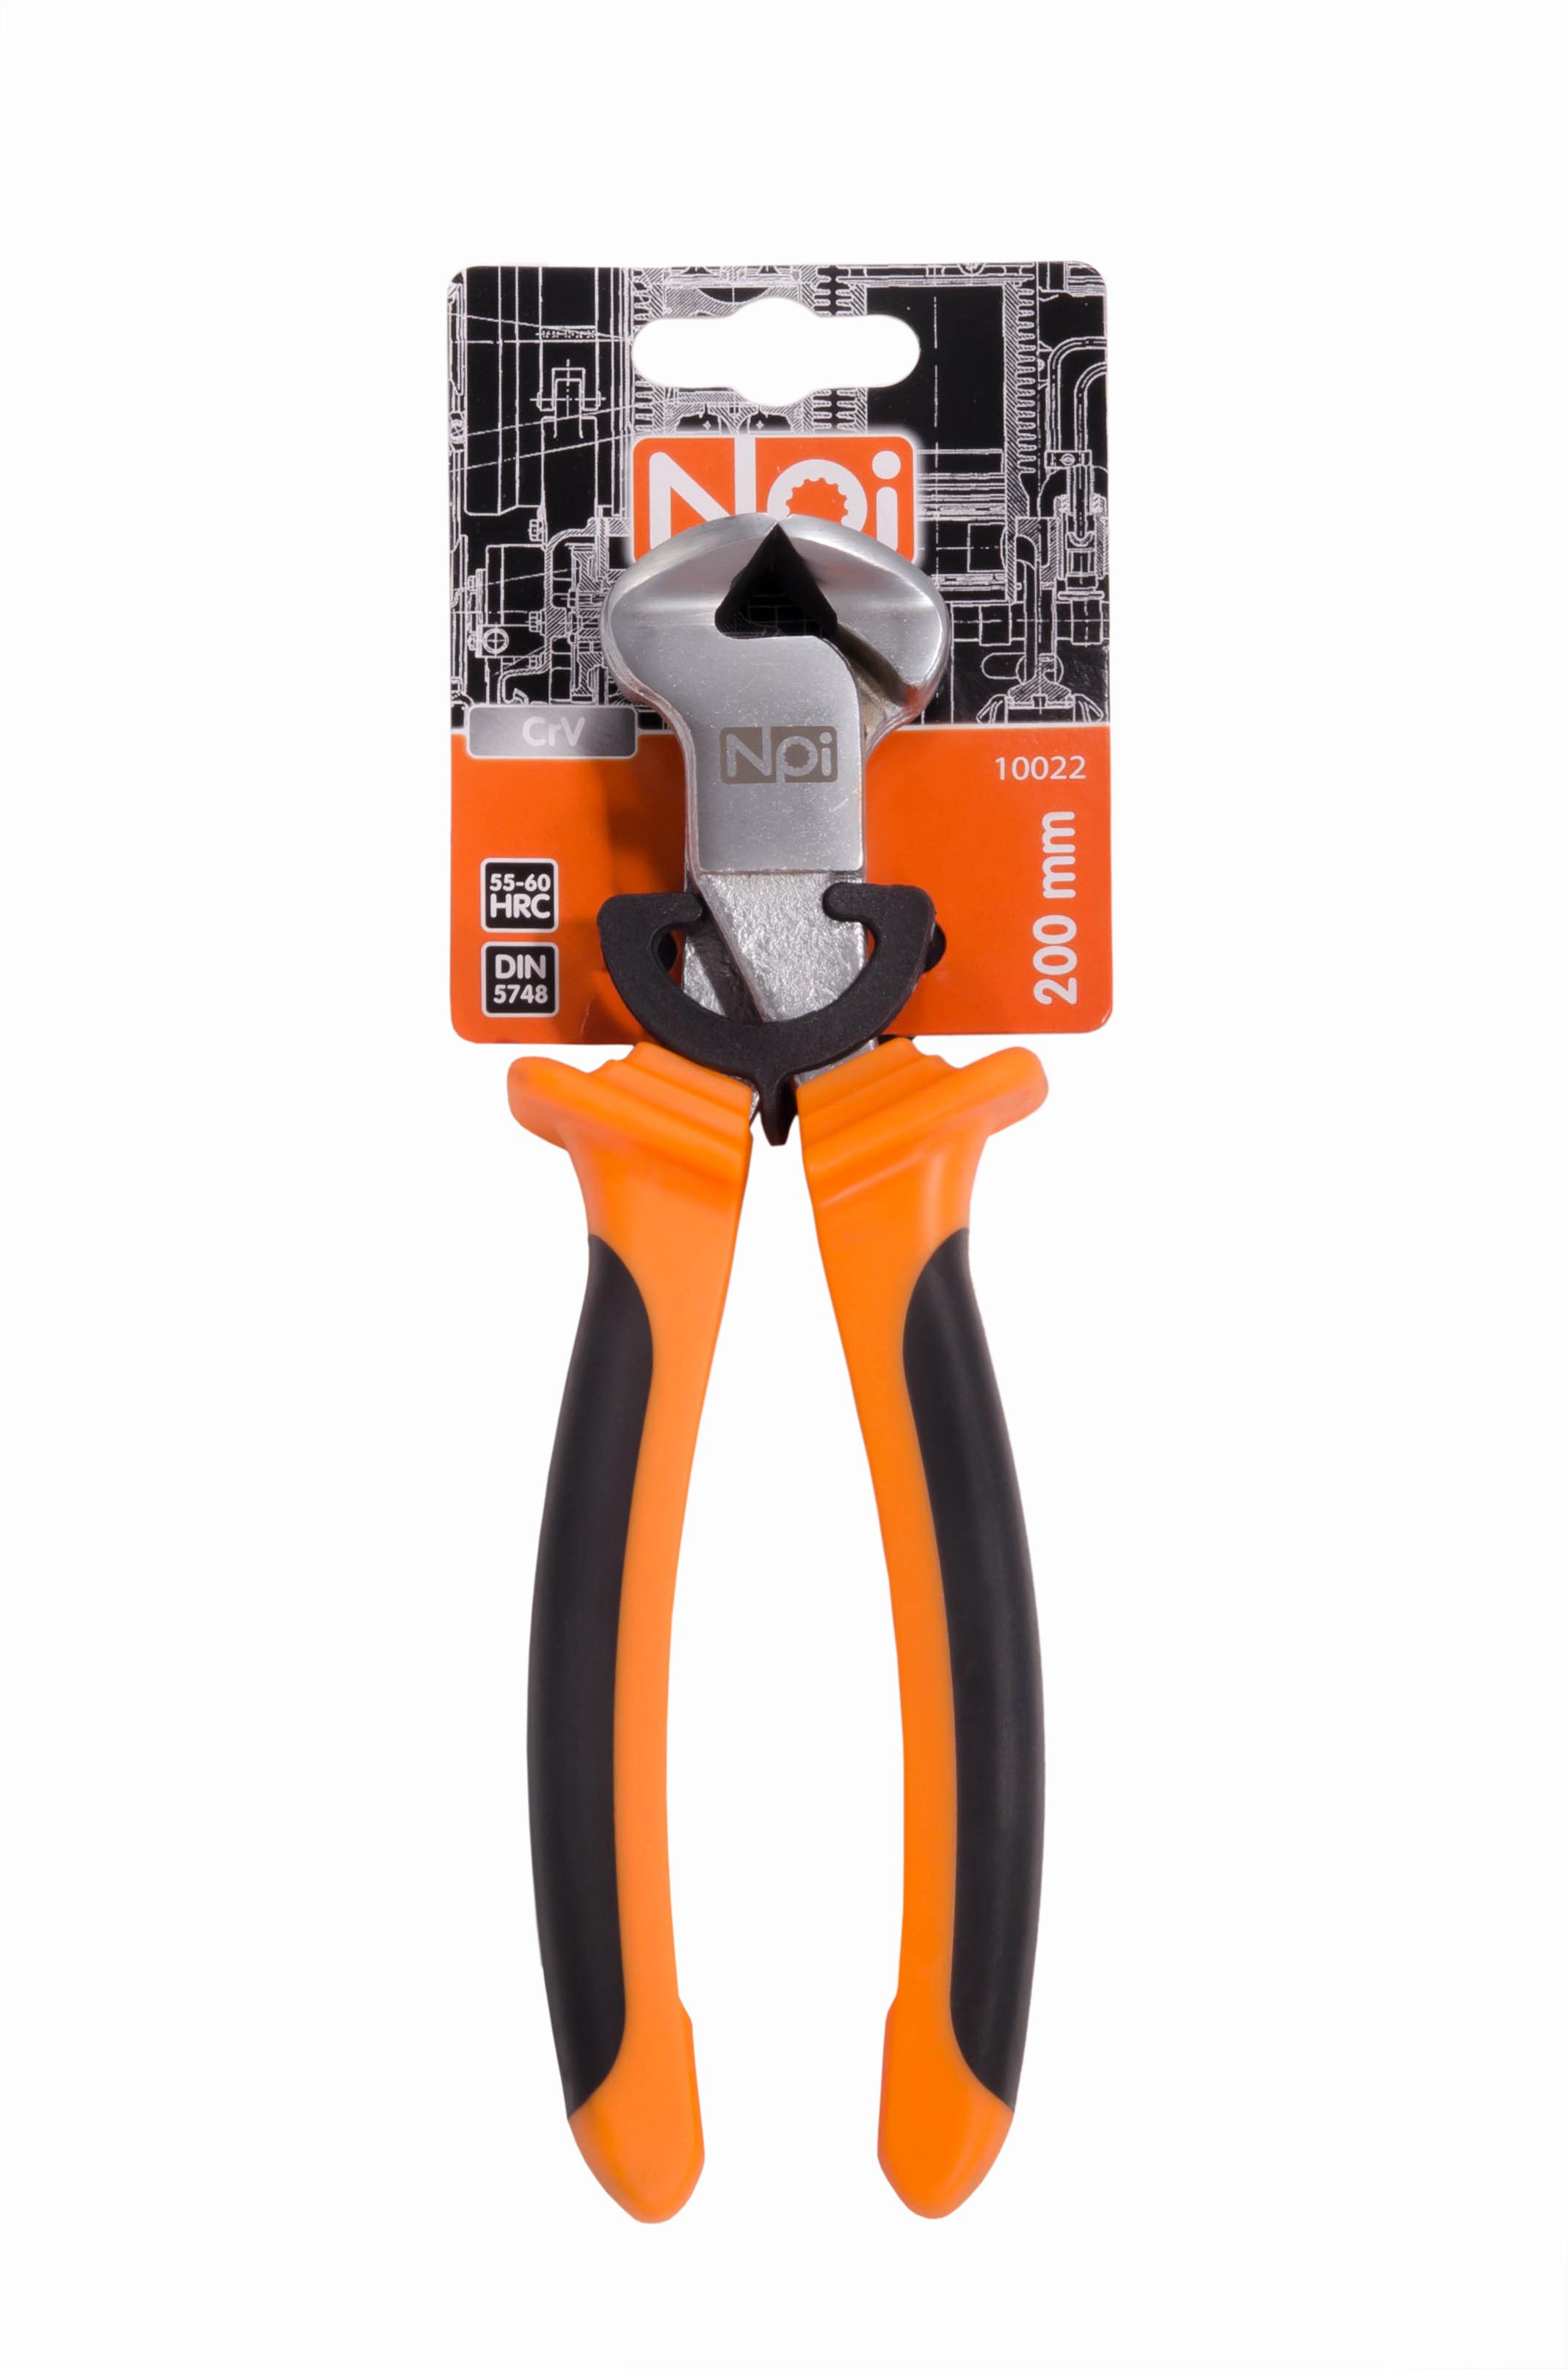 Кусачки Npi 10022 ключ телескопический трещоточный 1 4 150 200 мм crv хромир 2 х комп рукоятка gross